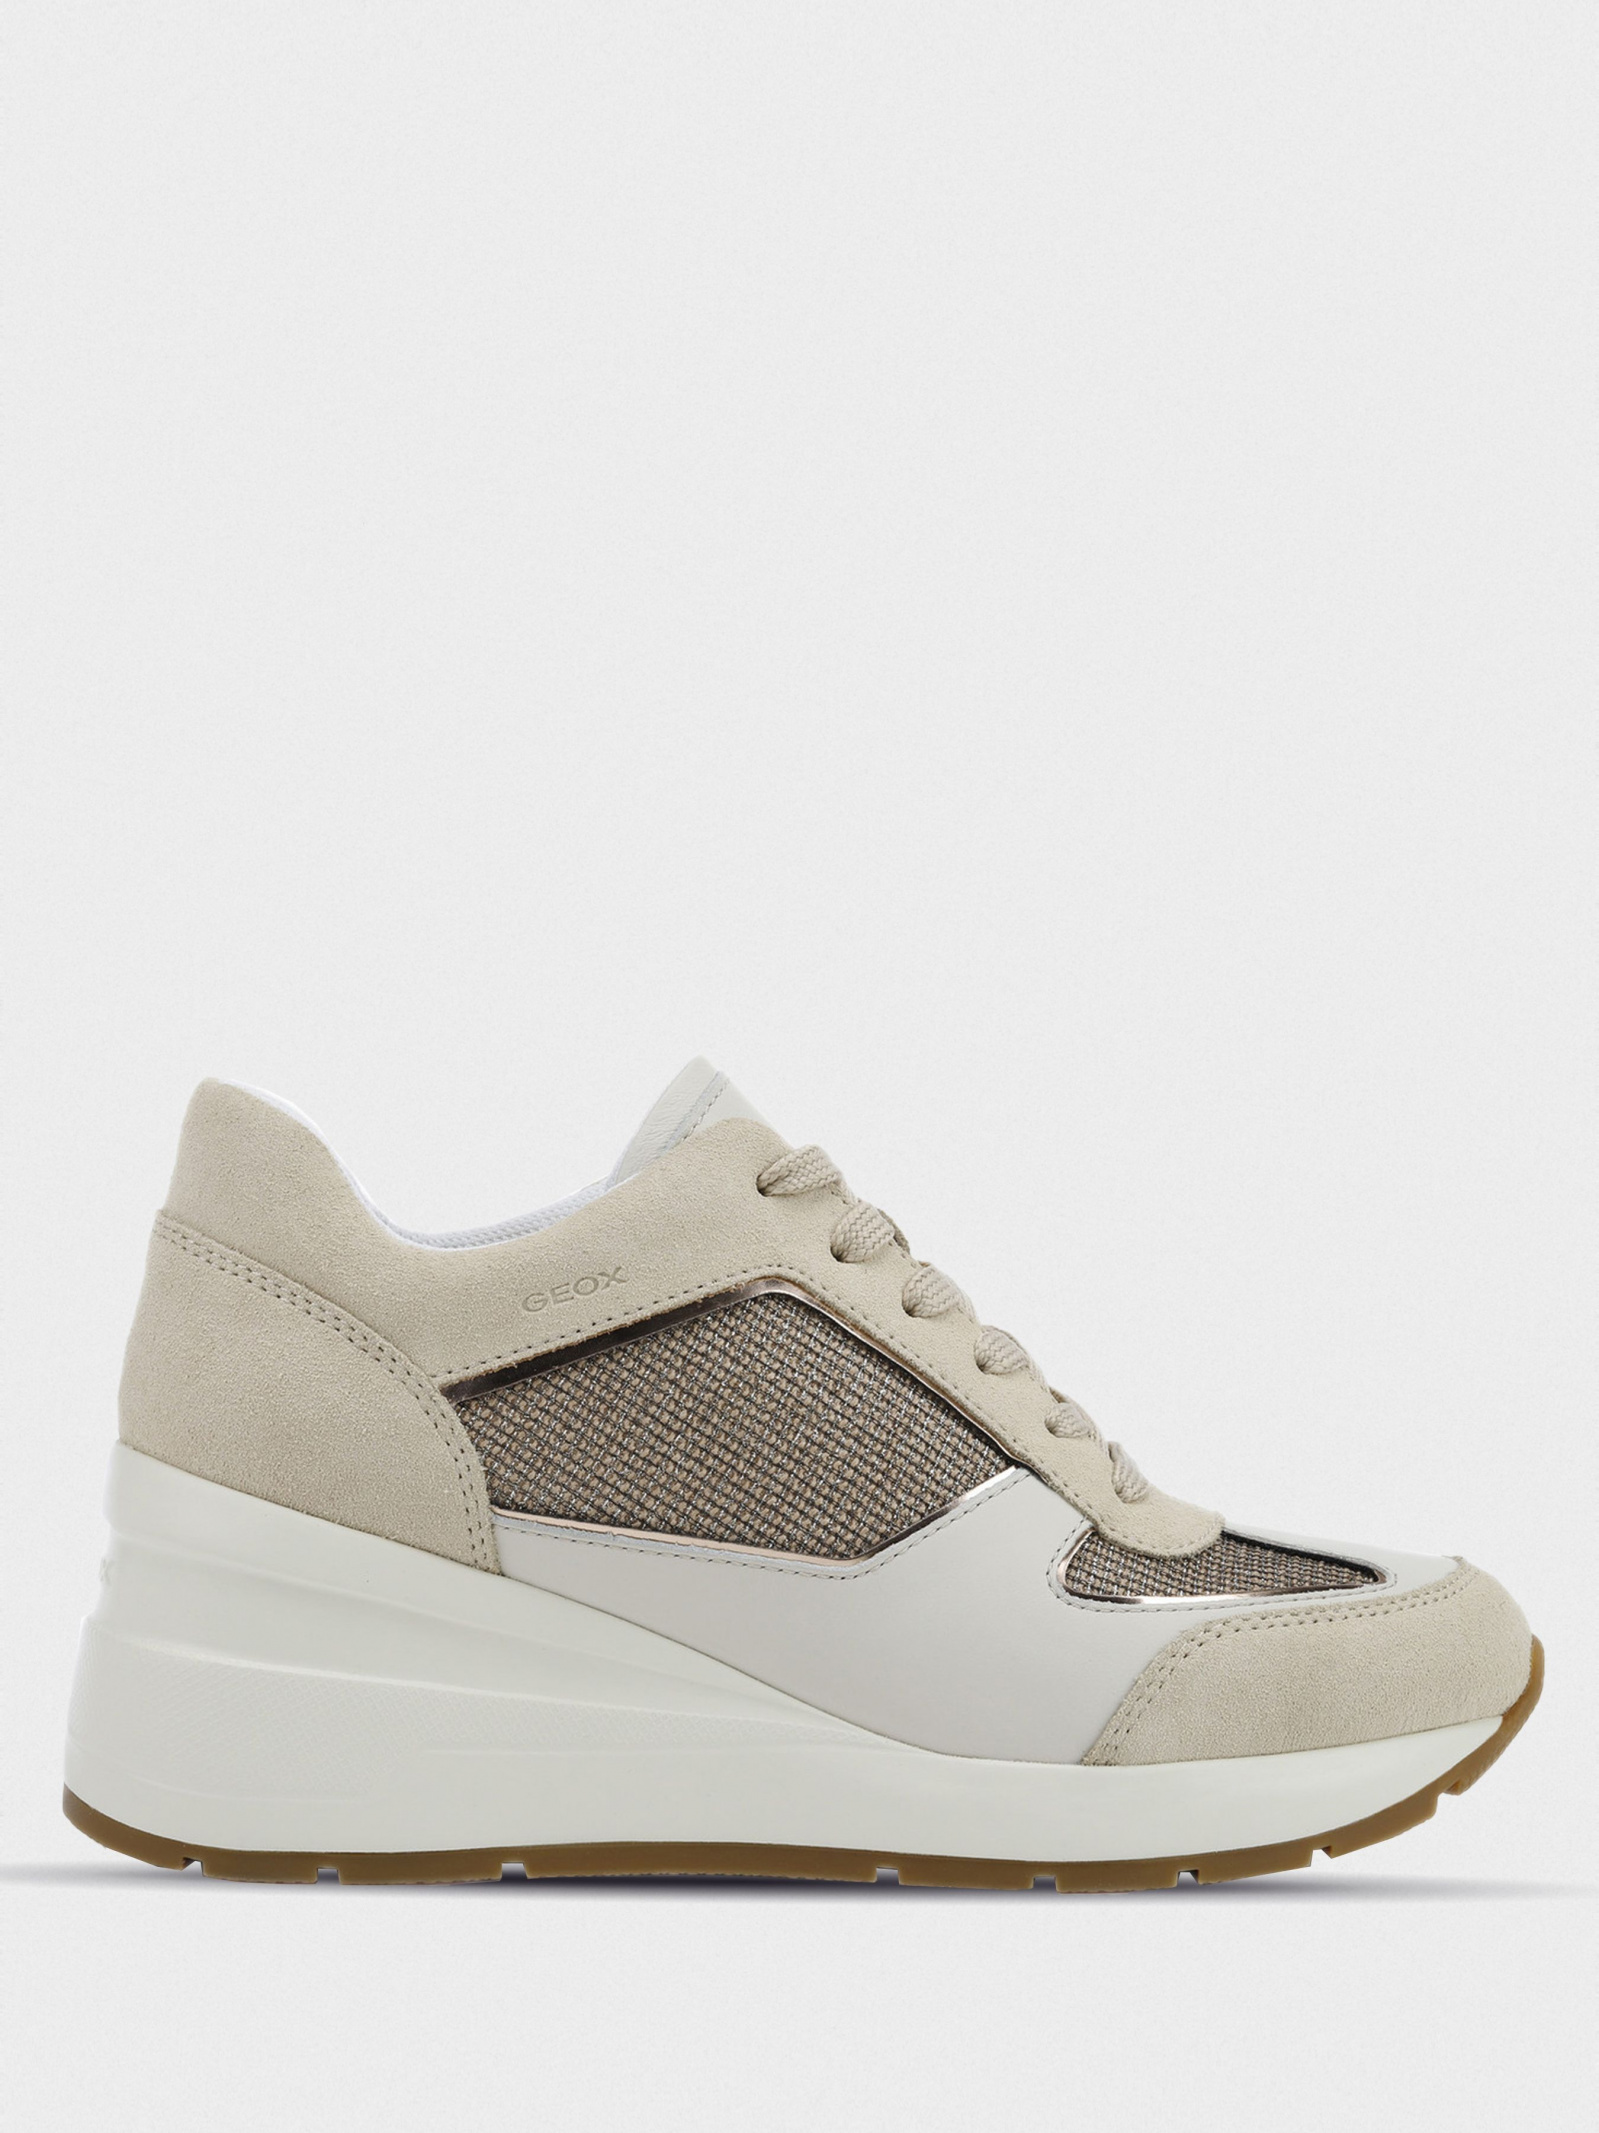 Ботинки для женщин Geox D ZOSMA XW3796 модная обувь, 2017